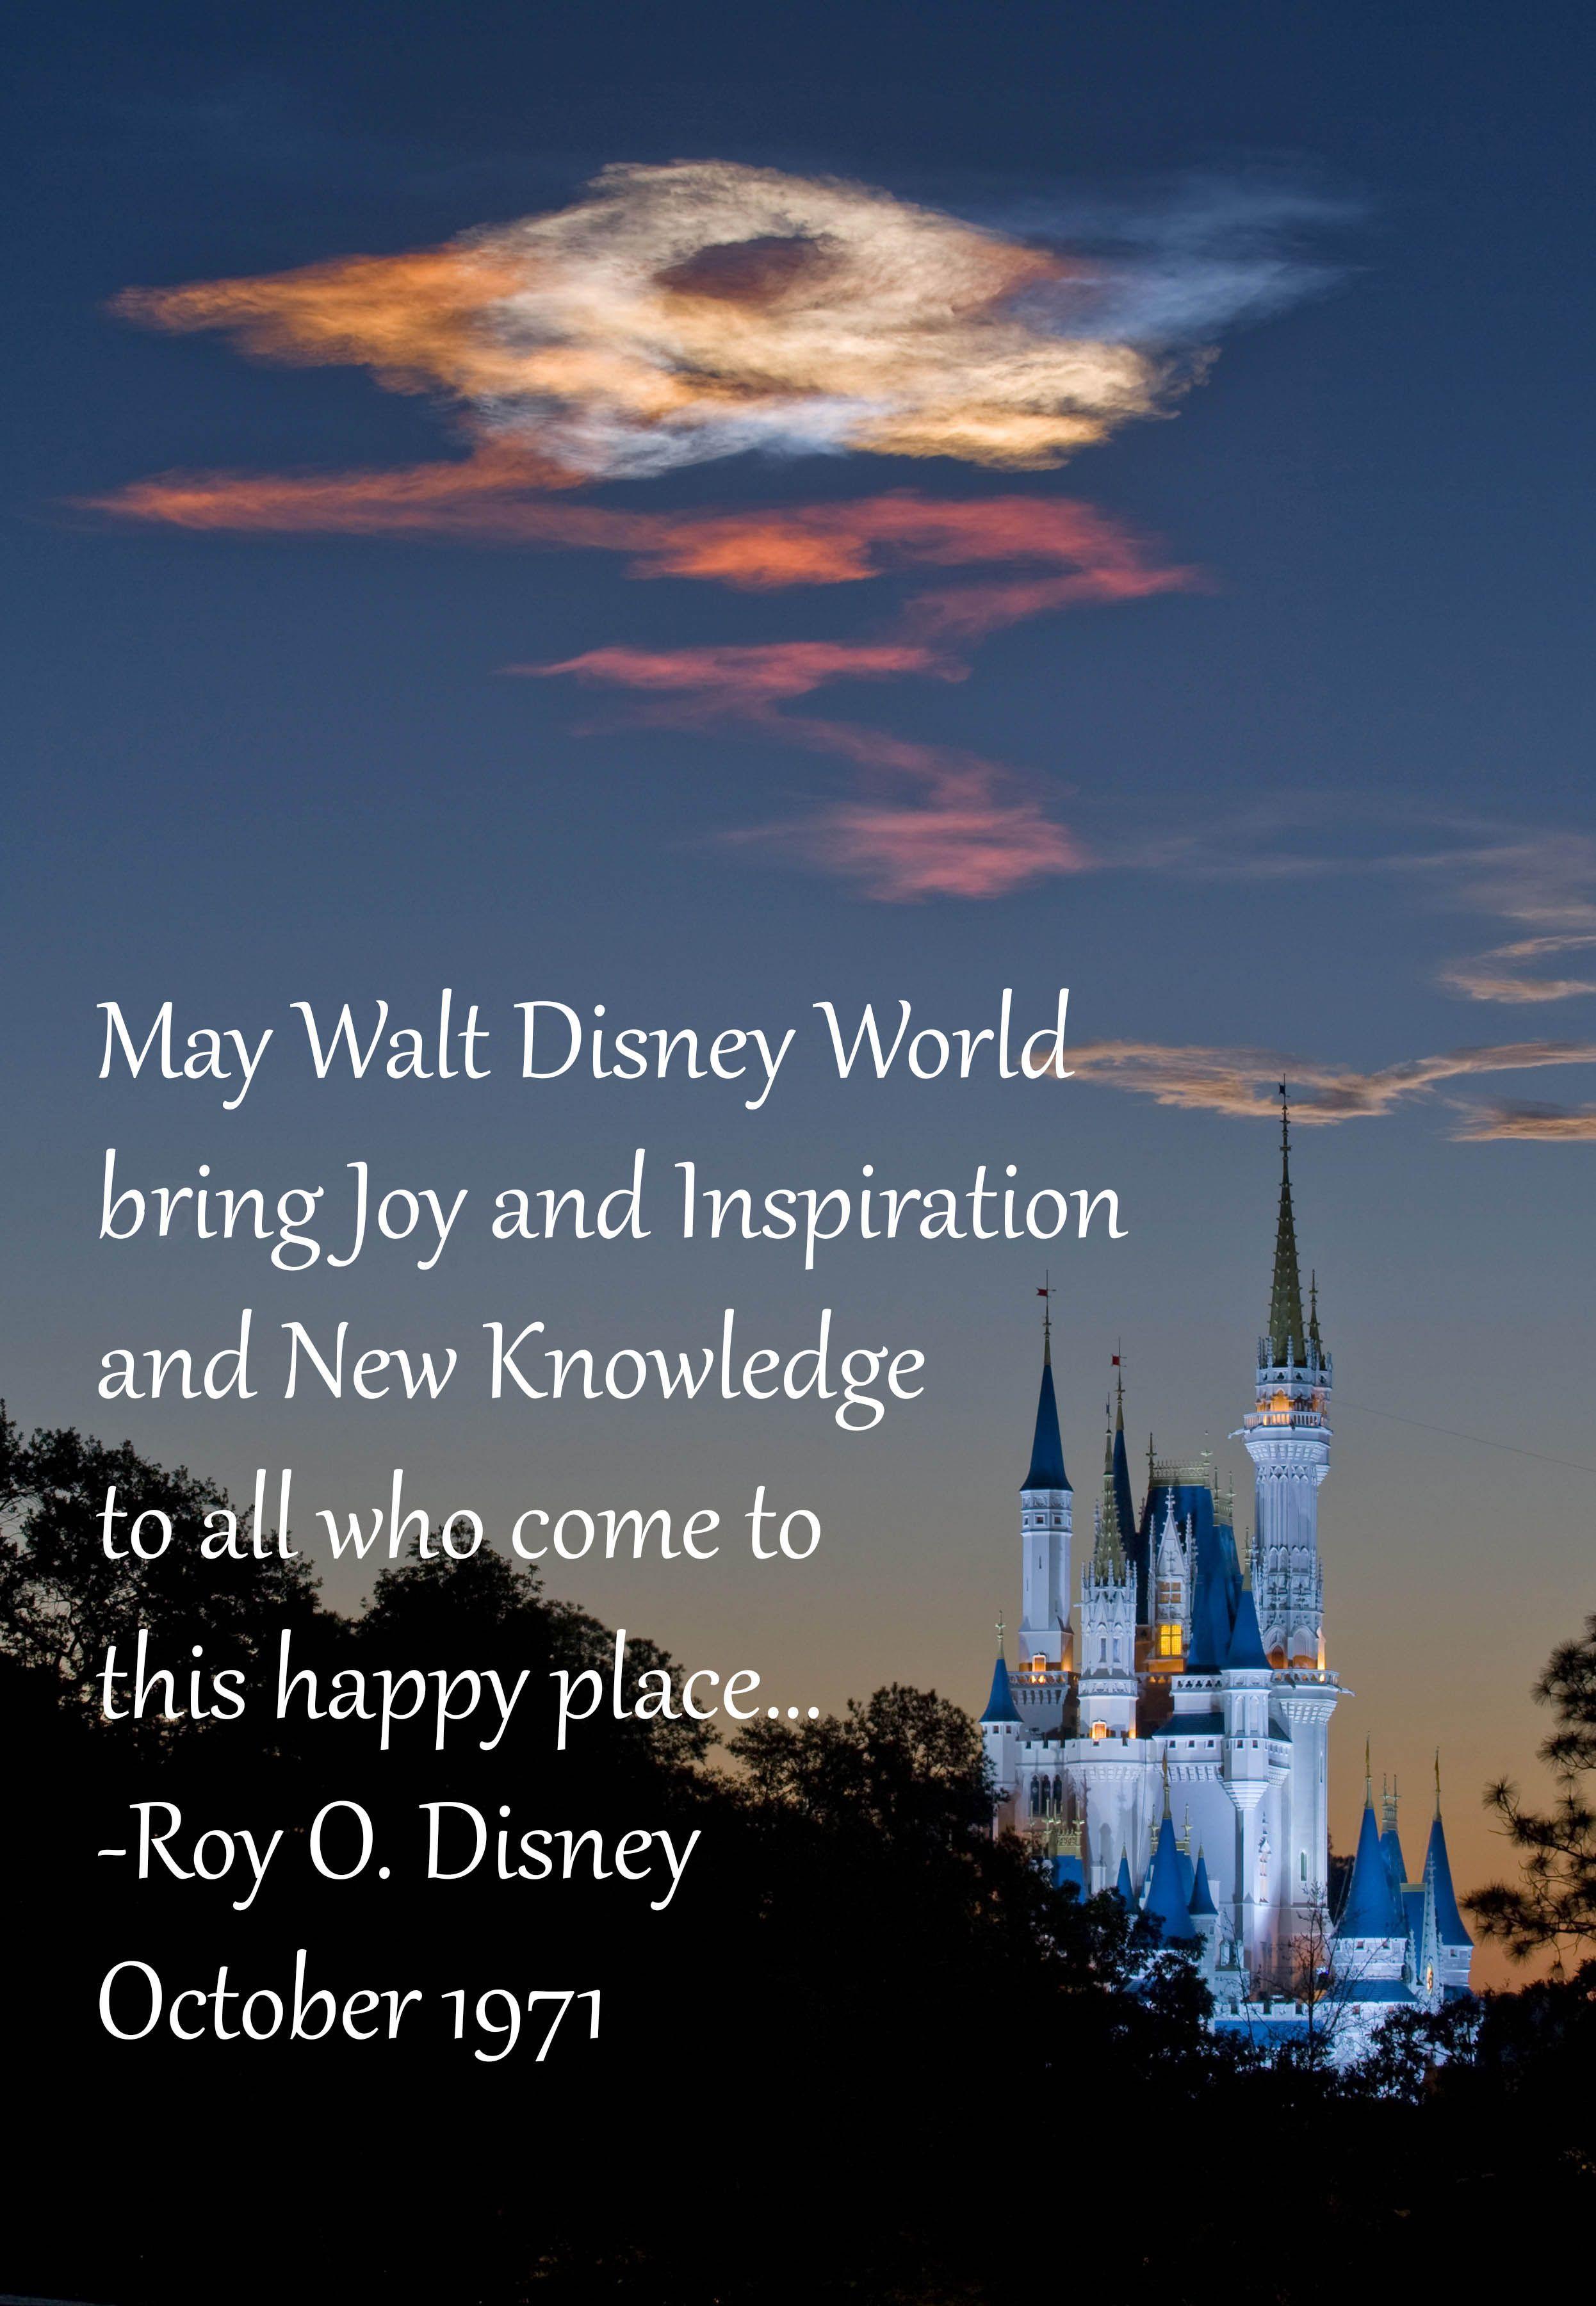 Happy birthday, Walt Disney World!